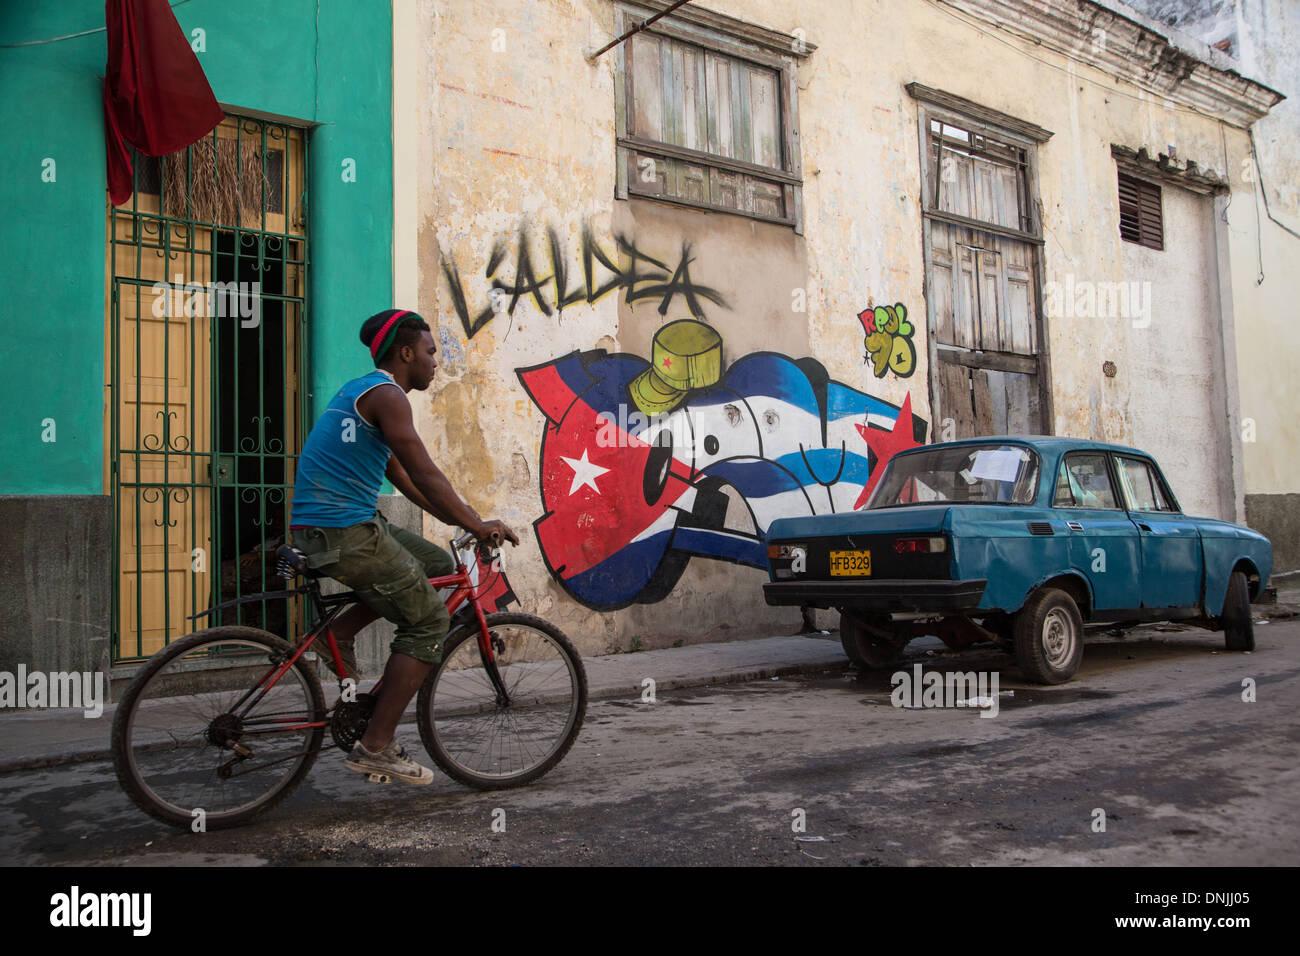 POLITICAL GRAFFITI ON THE WALLS IN THE CITY, HAVANA, CUBA, THE CARIBBEAN - Stock Image